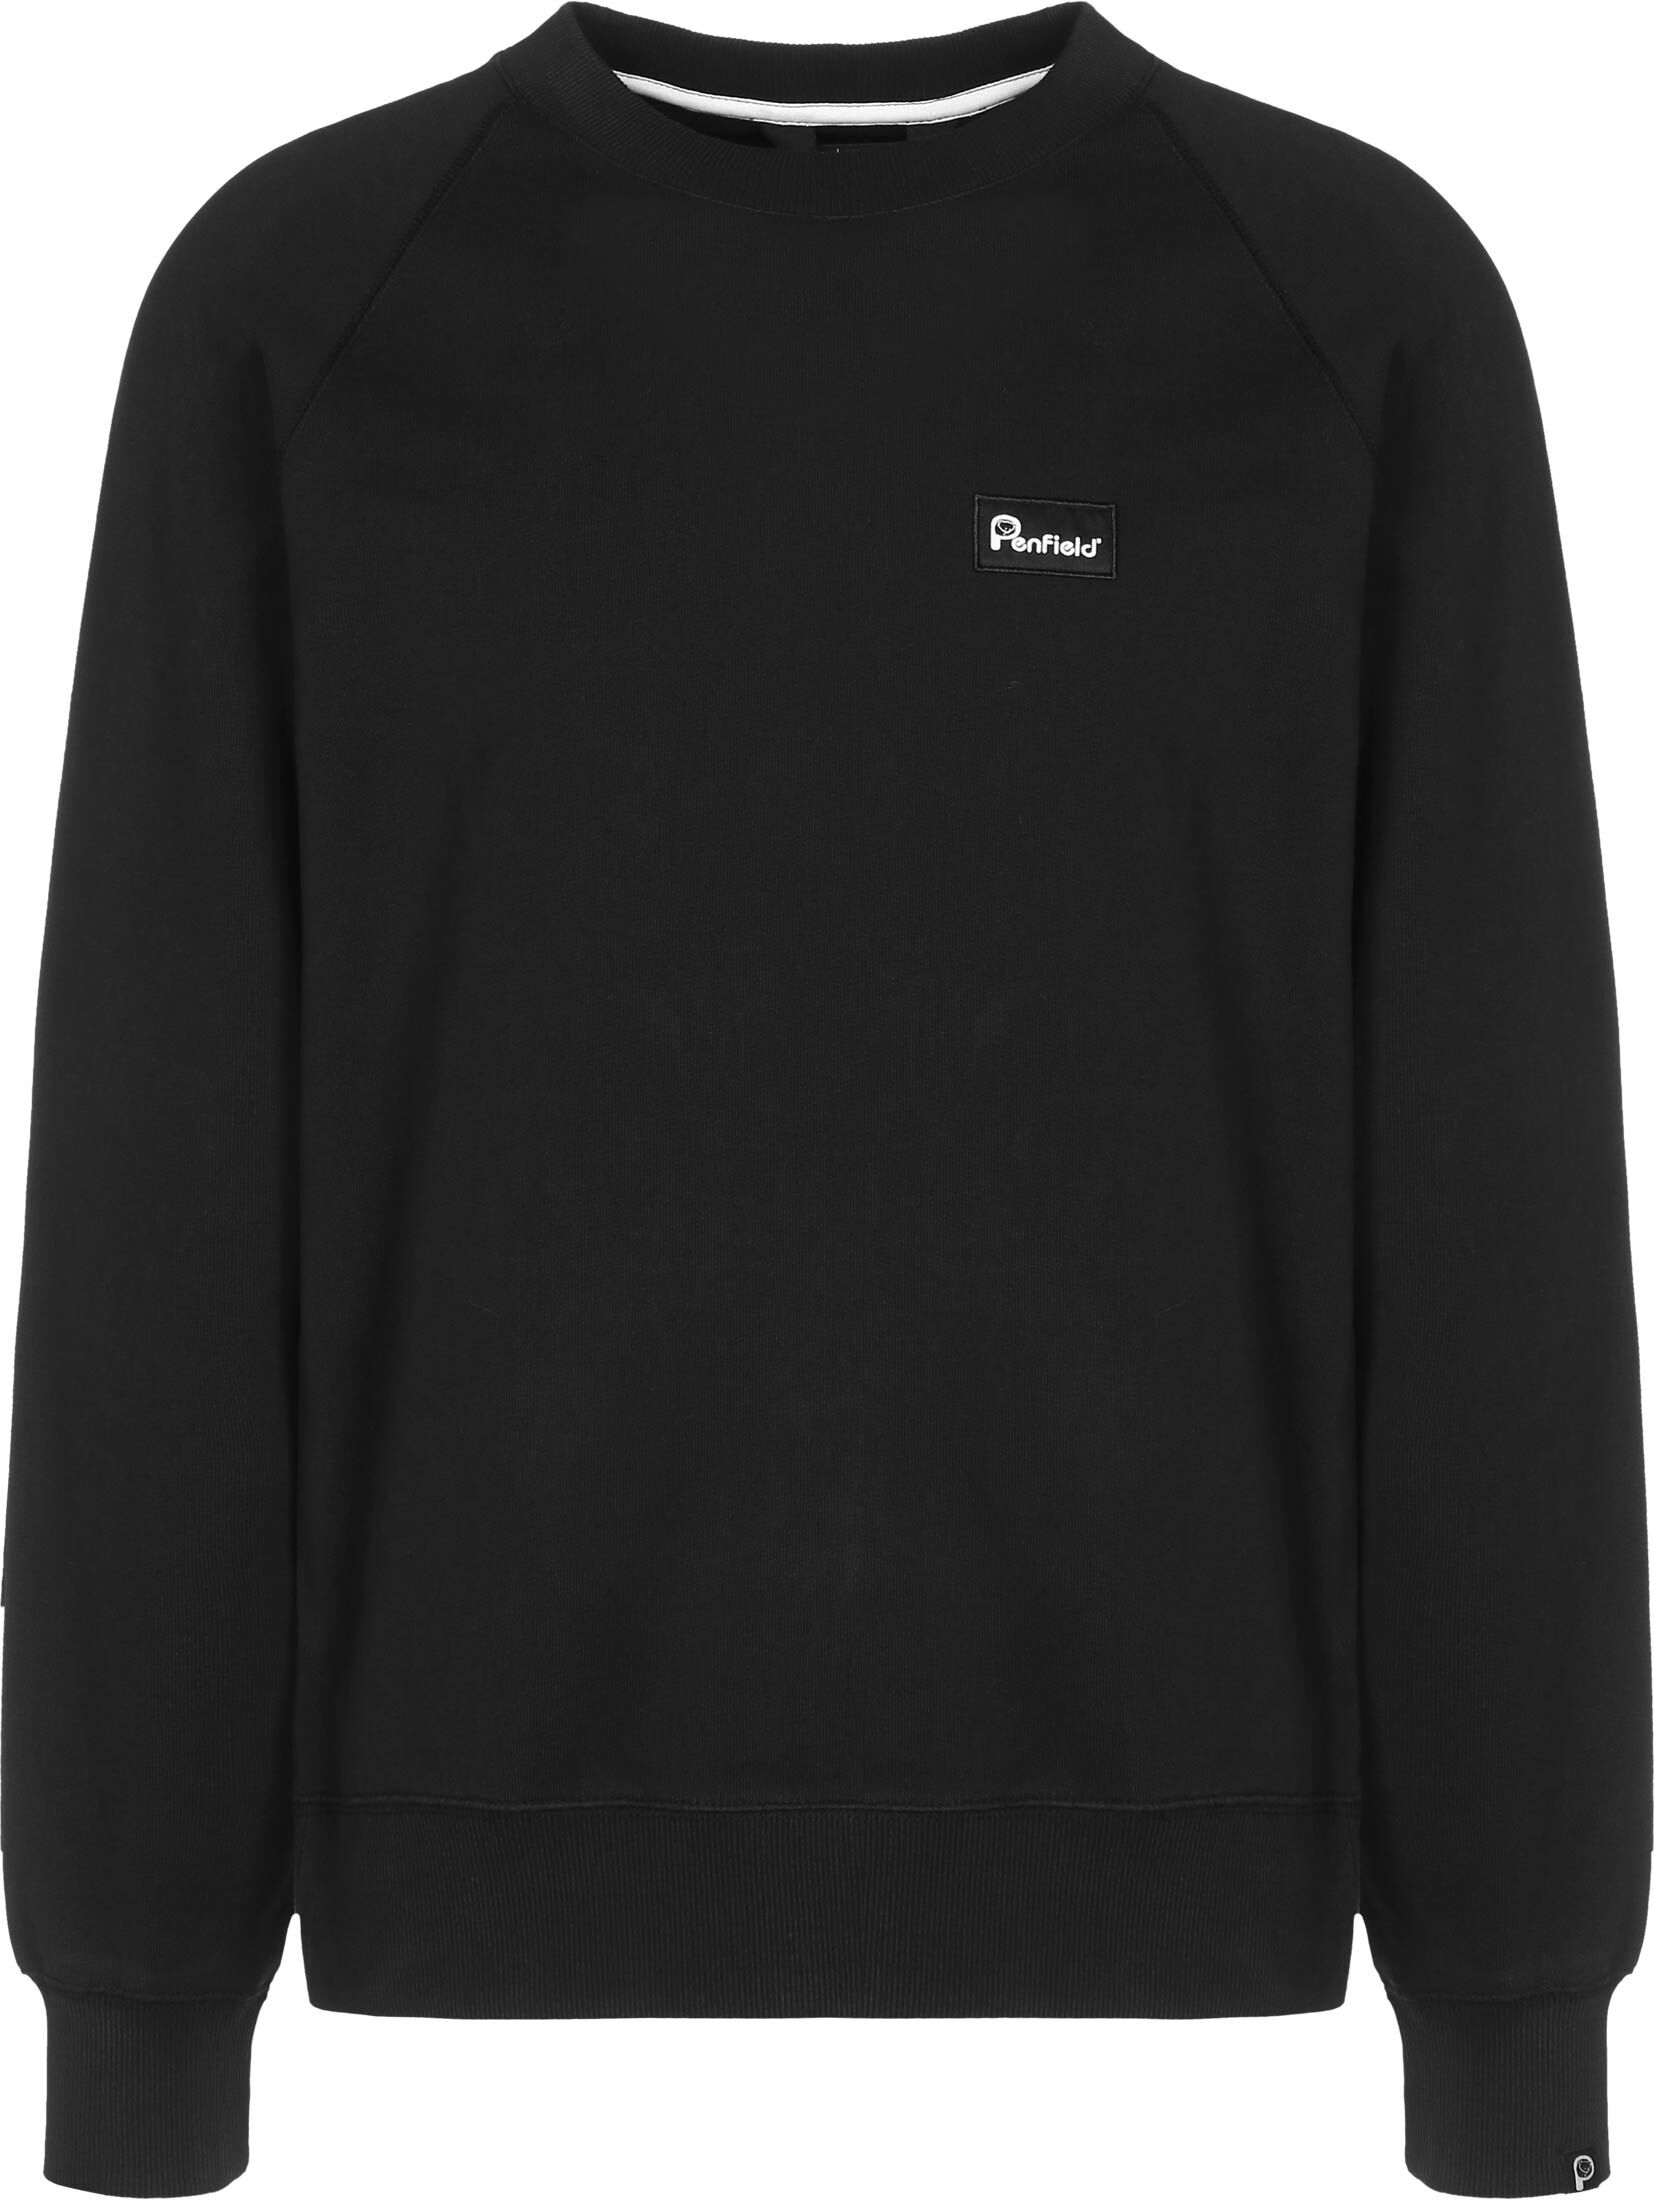 Penfield Errol sweatshirt